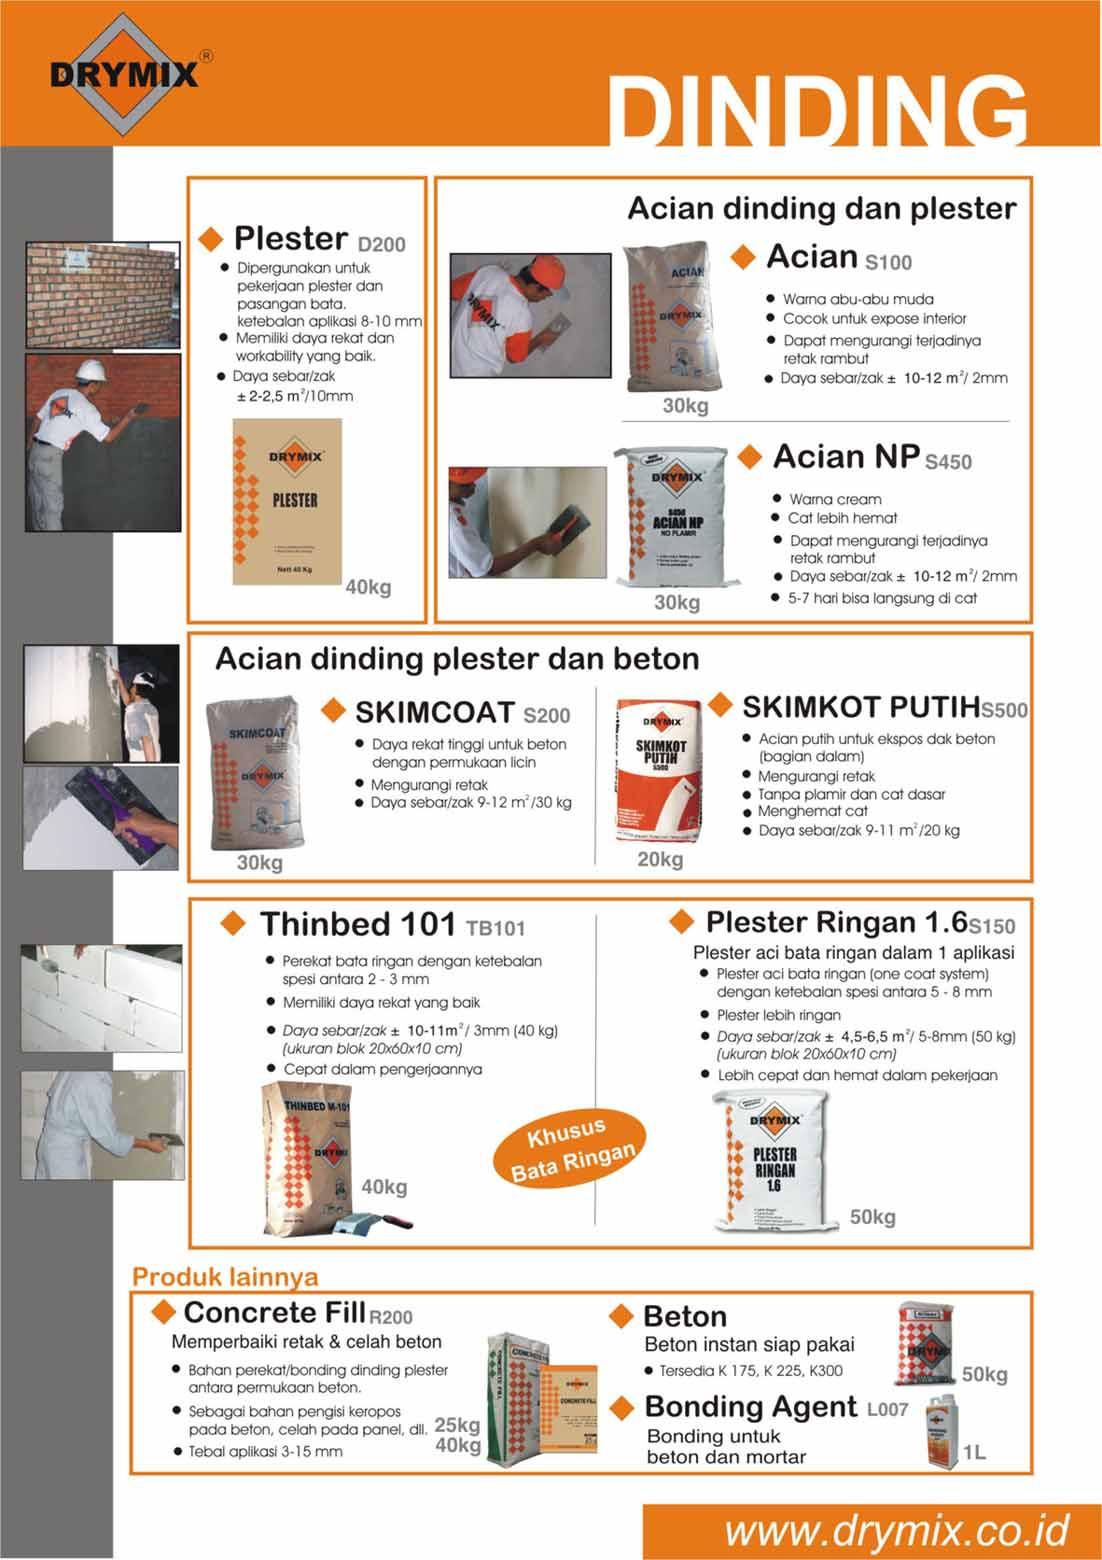 Mortar Instan Drymix untuk Aplikasi Dinding